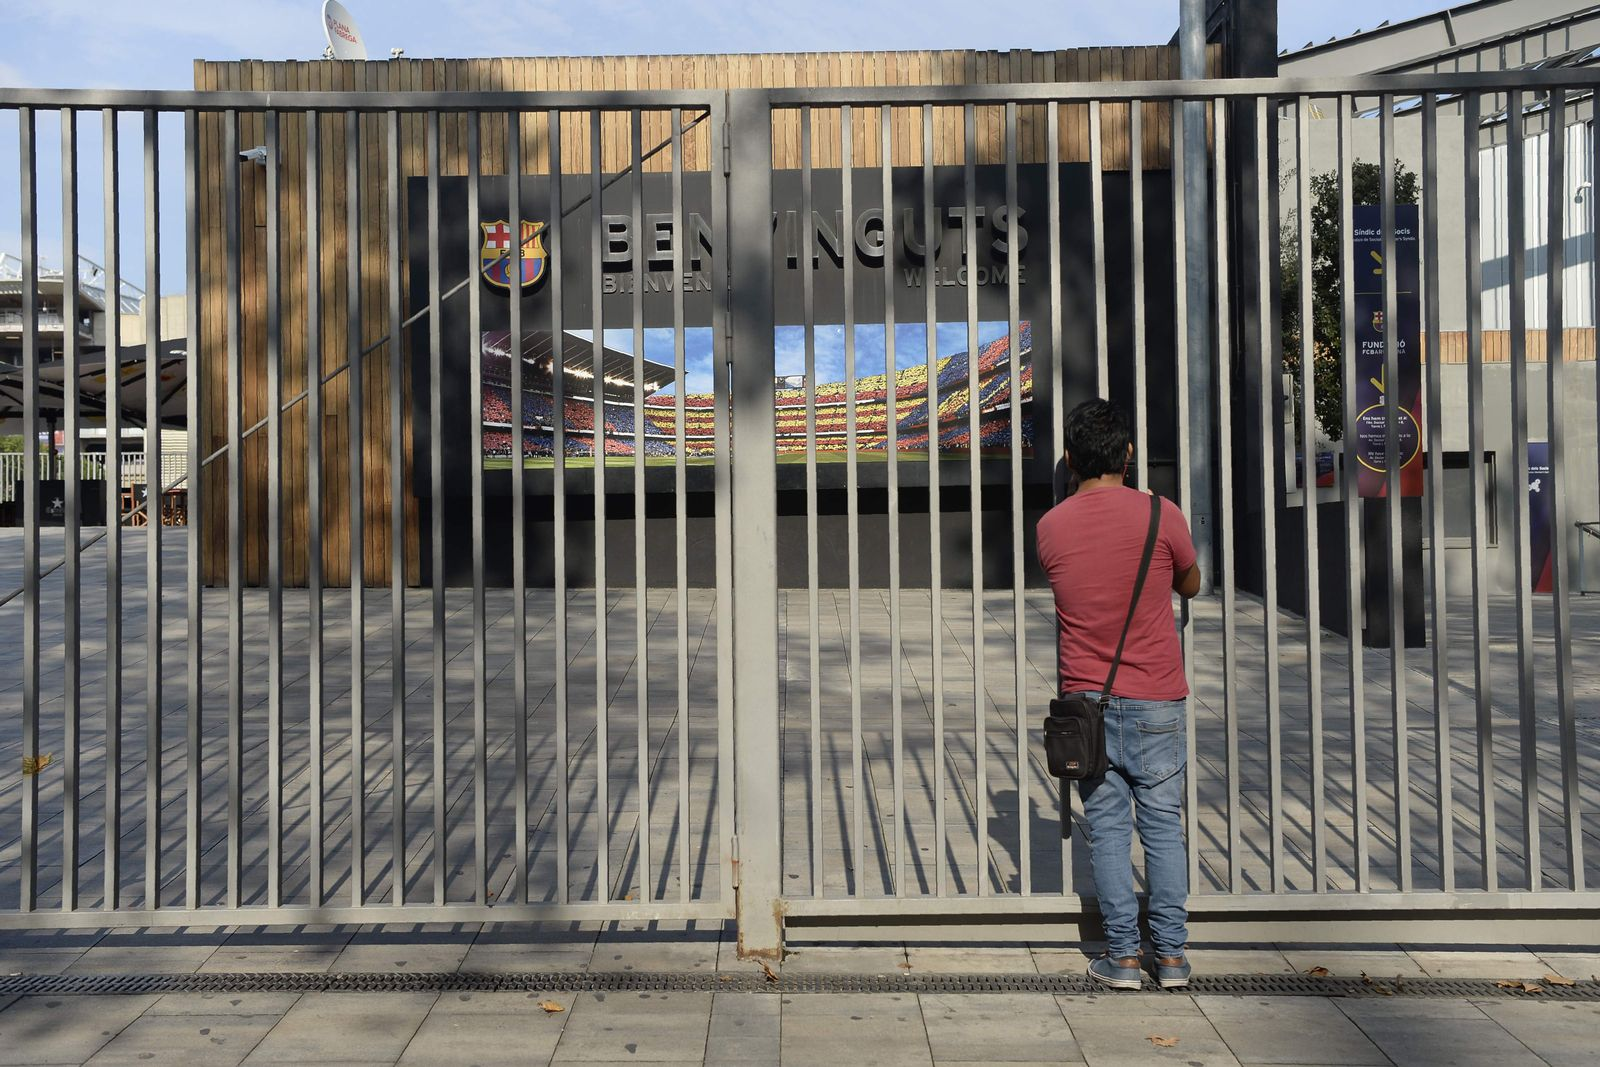 FBL-BARCELONA-SPAIN-CATALONIA-POLITICS-INDEPENDENCE-STRIKE